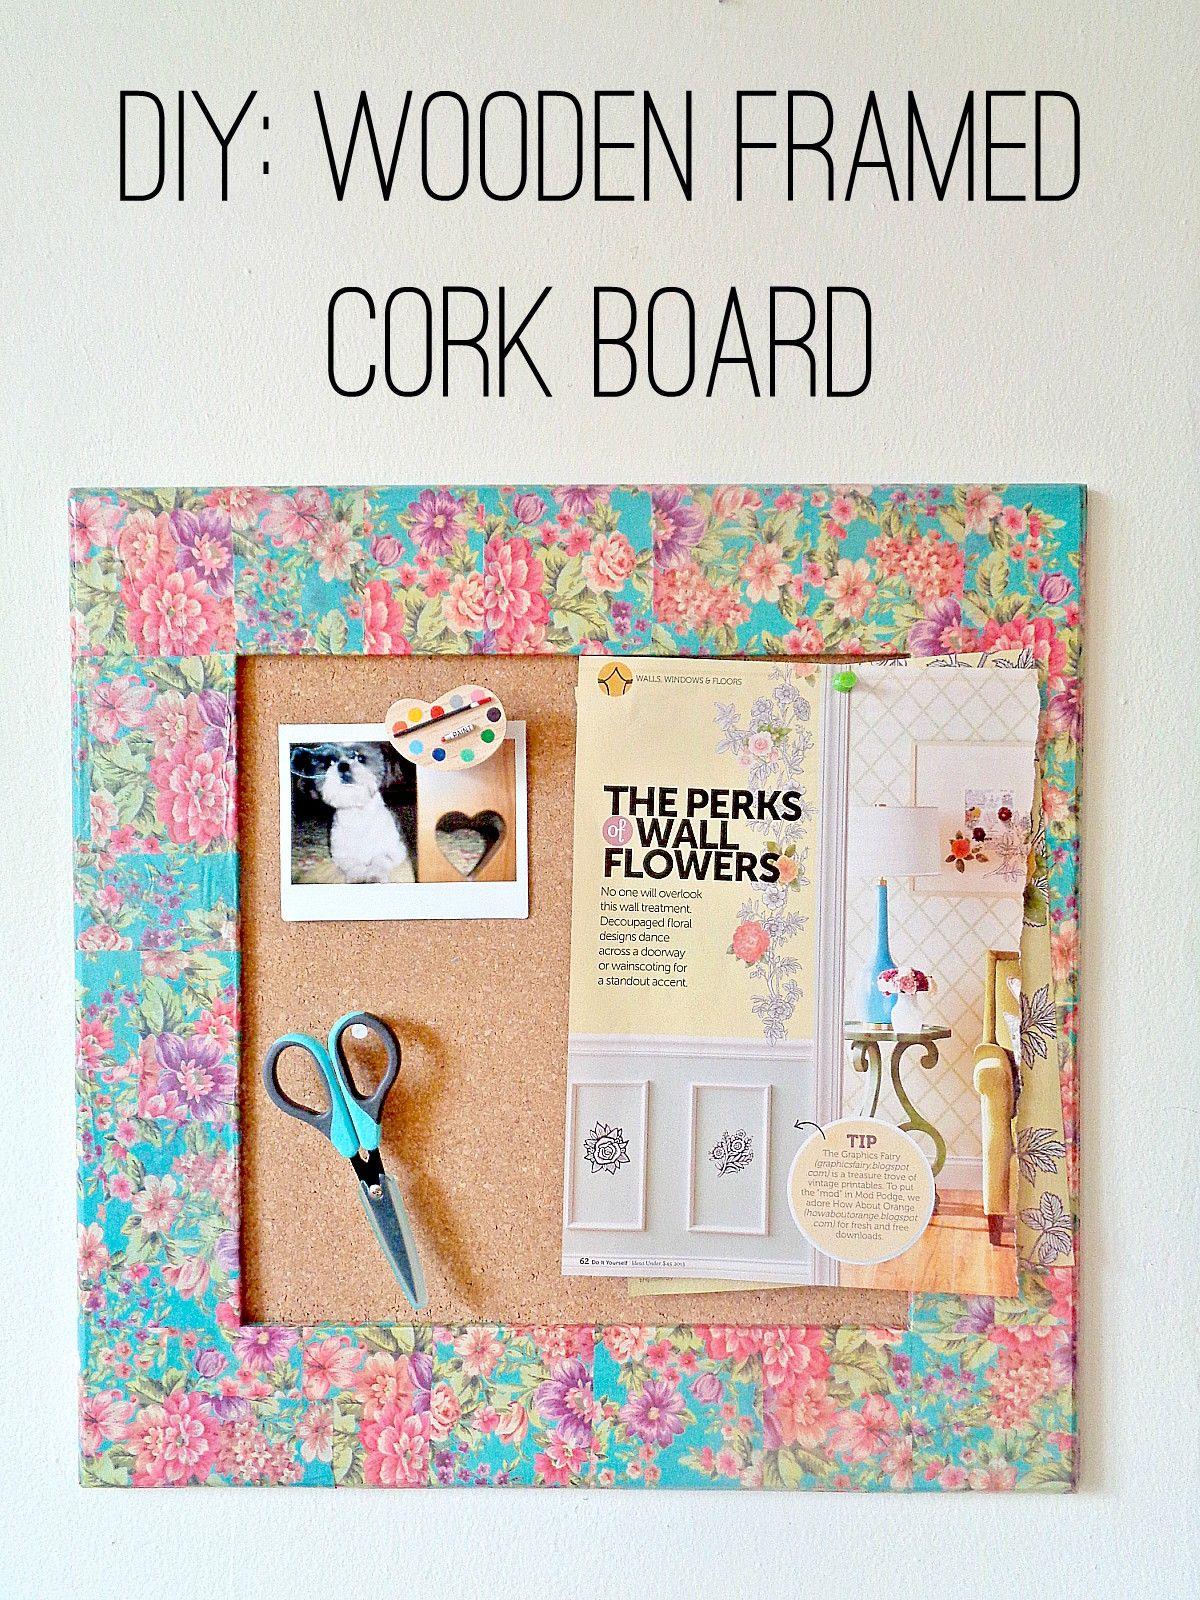 Cork board organizer decorated with tissue paper